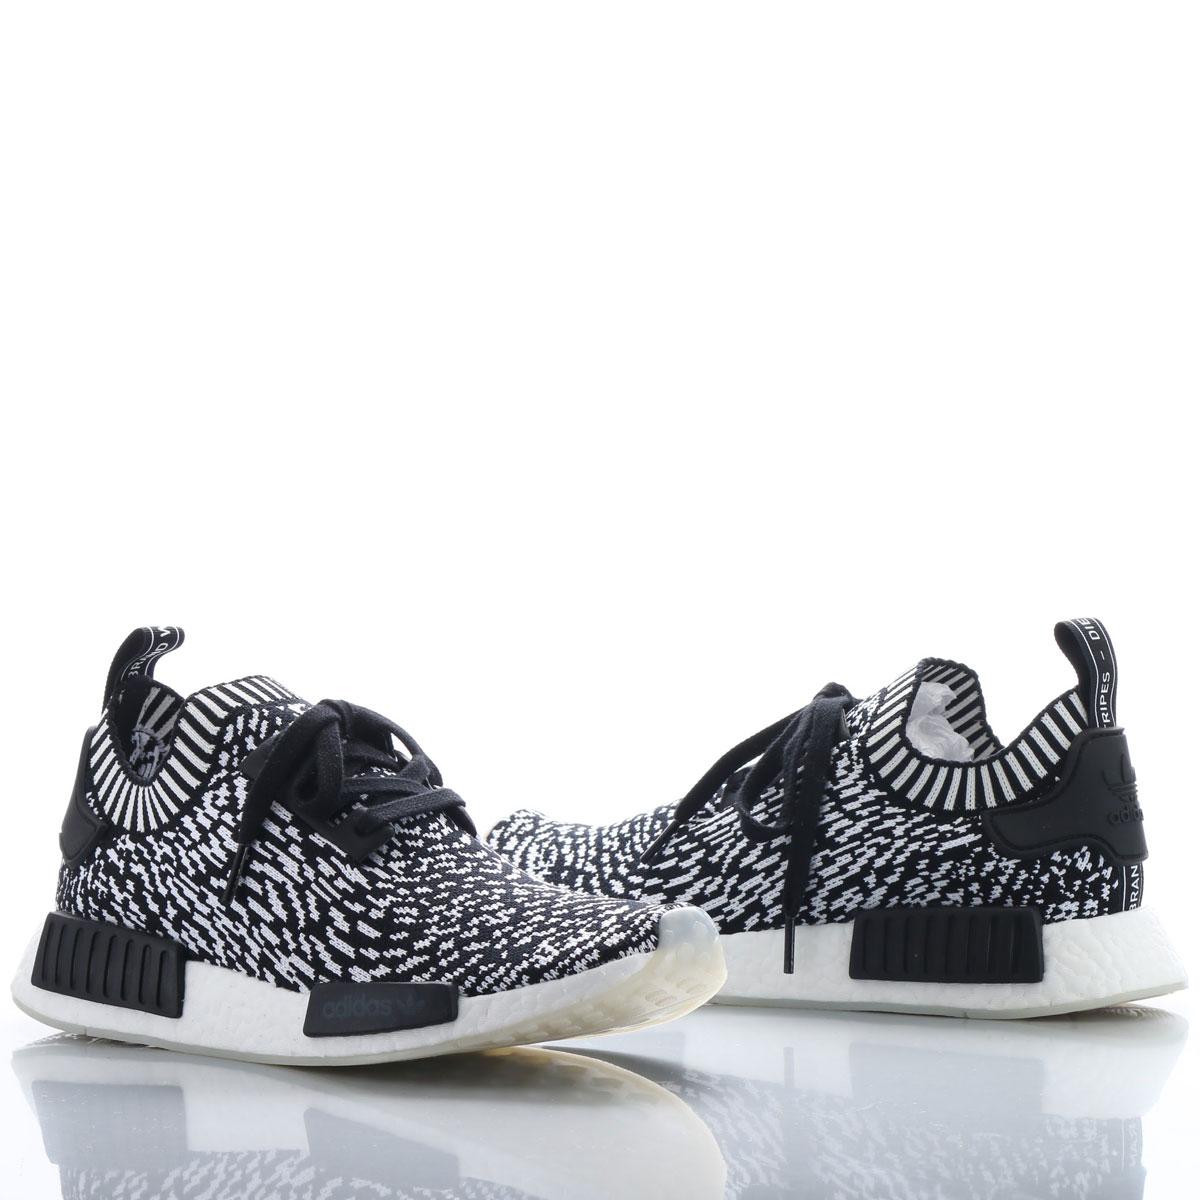 adidas Originals NMD_R1 PK (アディダス オリジナルス NMD_R1 PK)CORE BLACK/CORE/BLACK/RUNNING WHITE【メンズ スニーカー】17FW-S